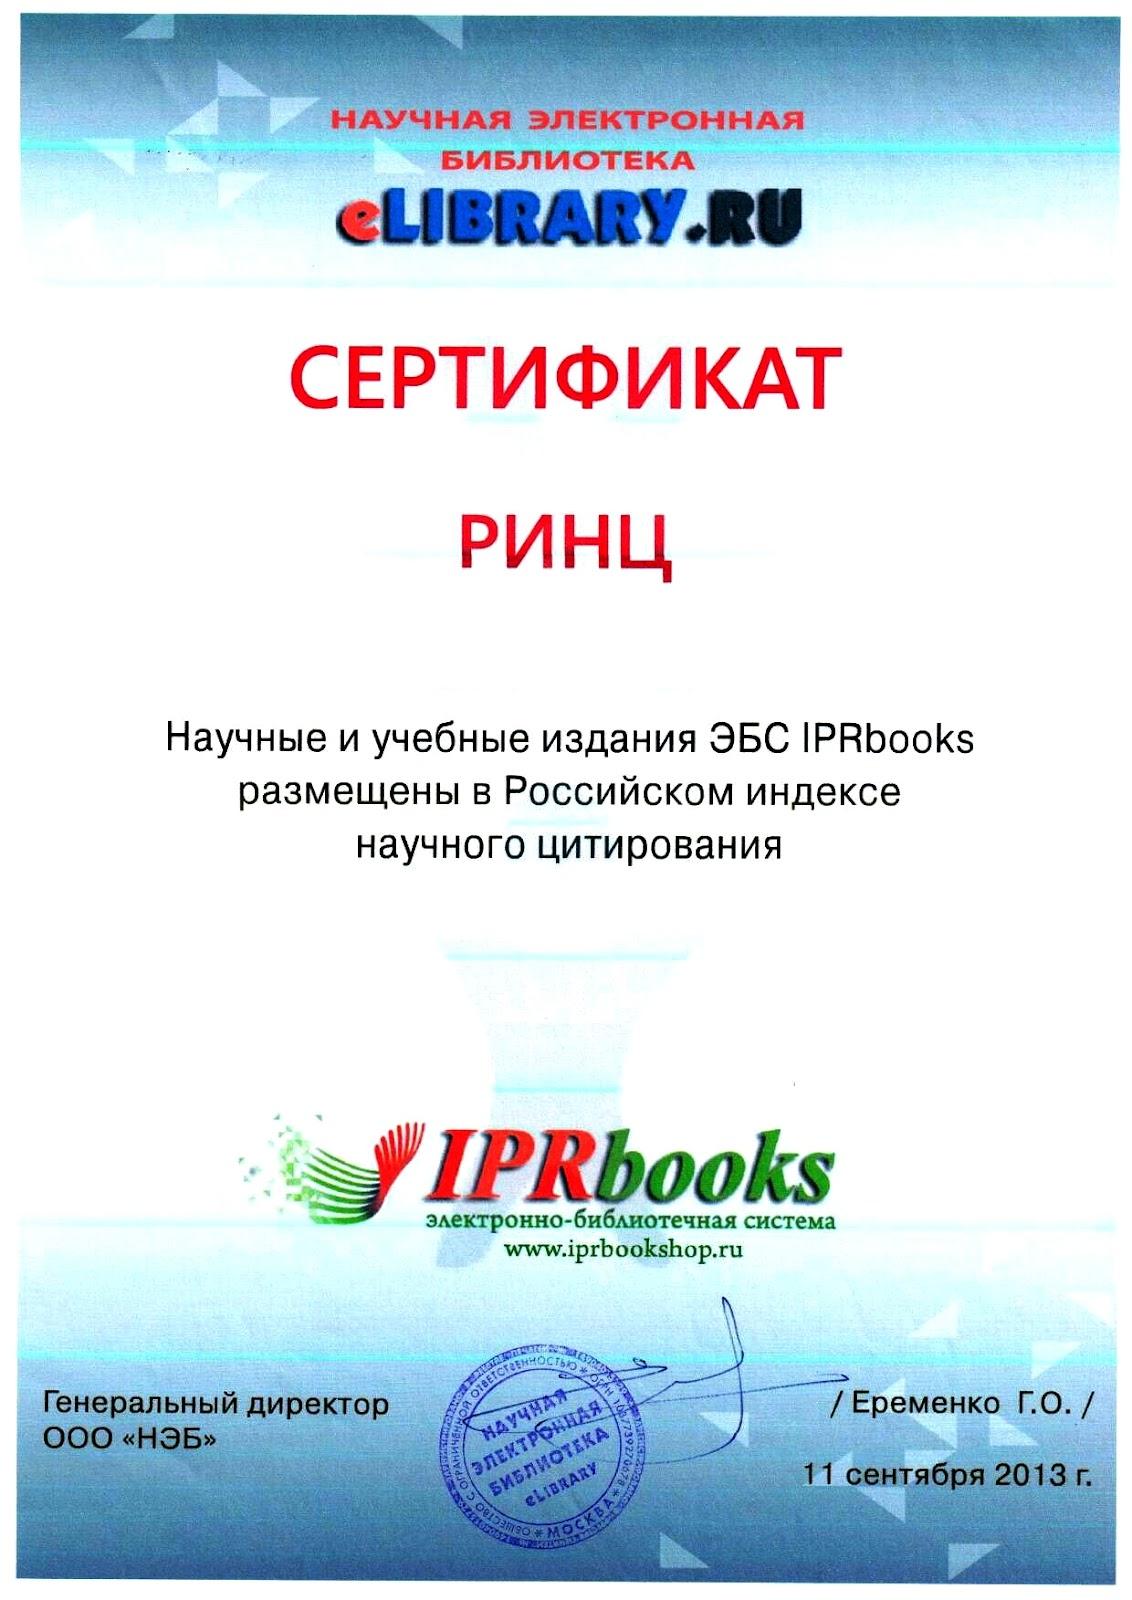 сертификат РИНЦ - копия1.jpg